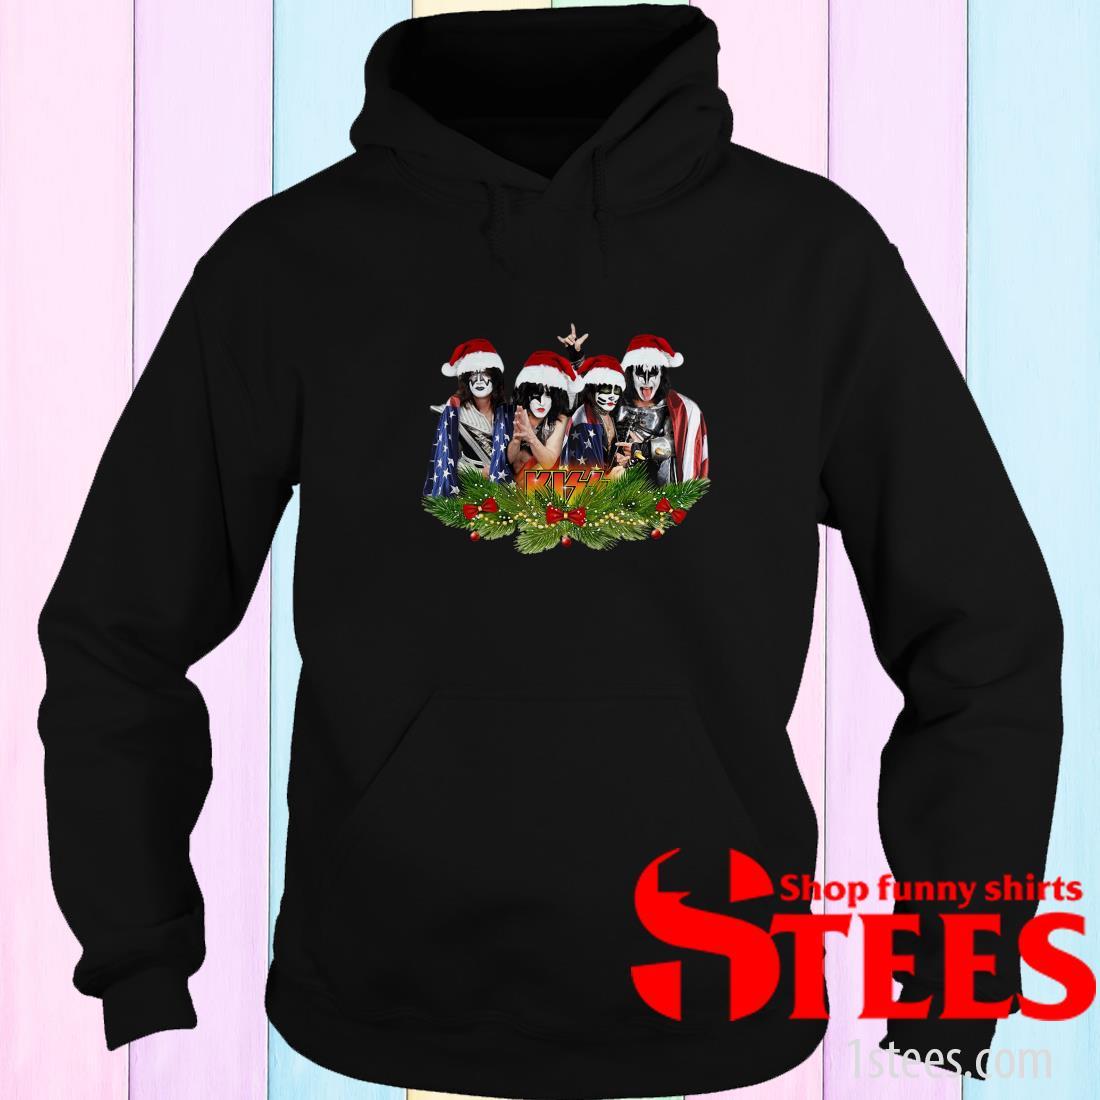 Kiss Band Santa Christmas Sweater